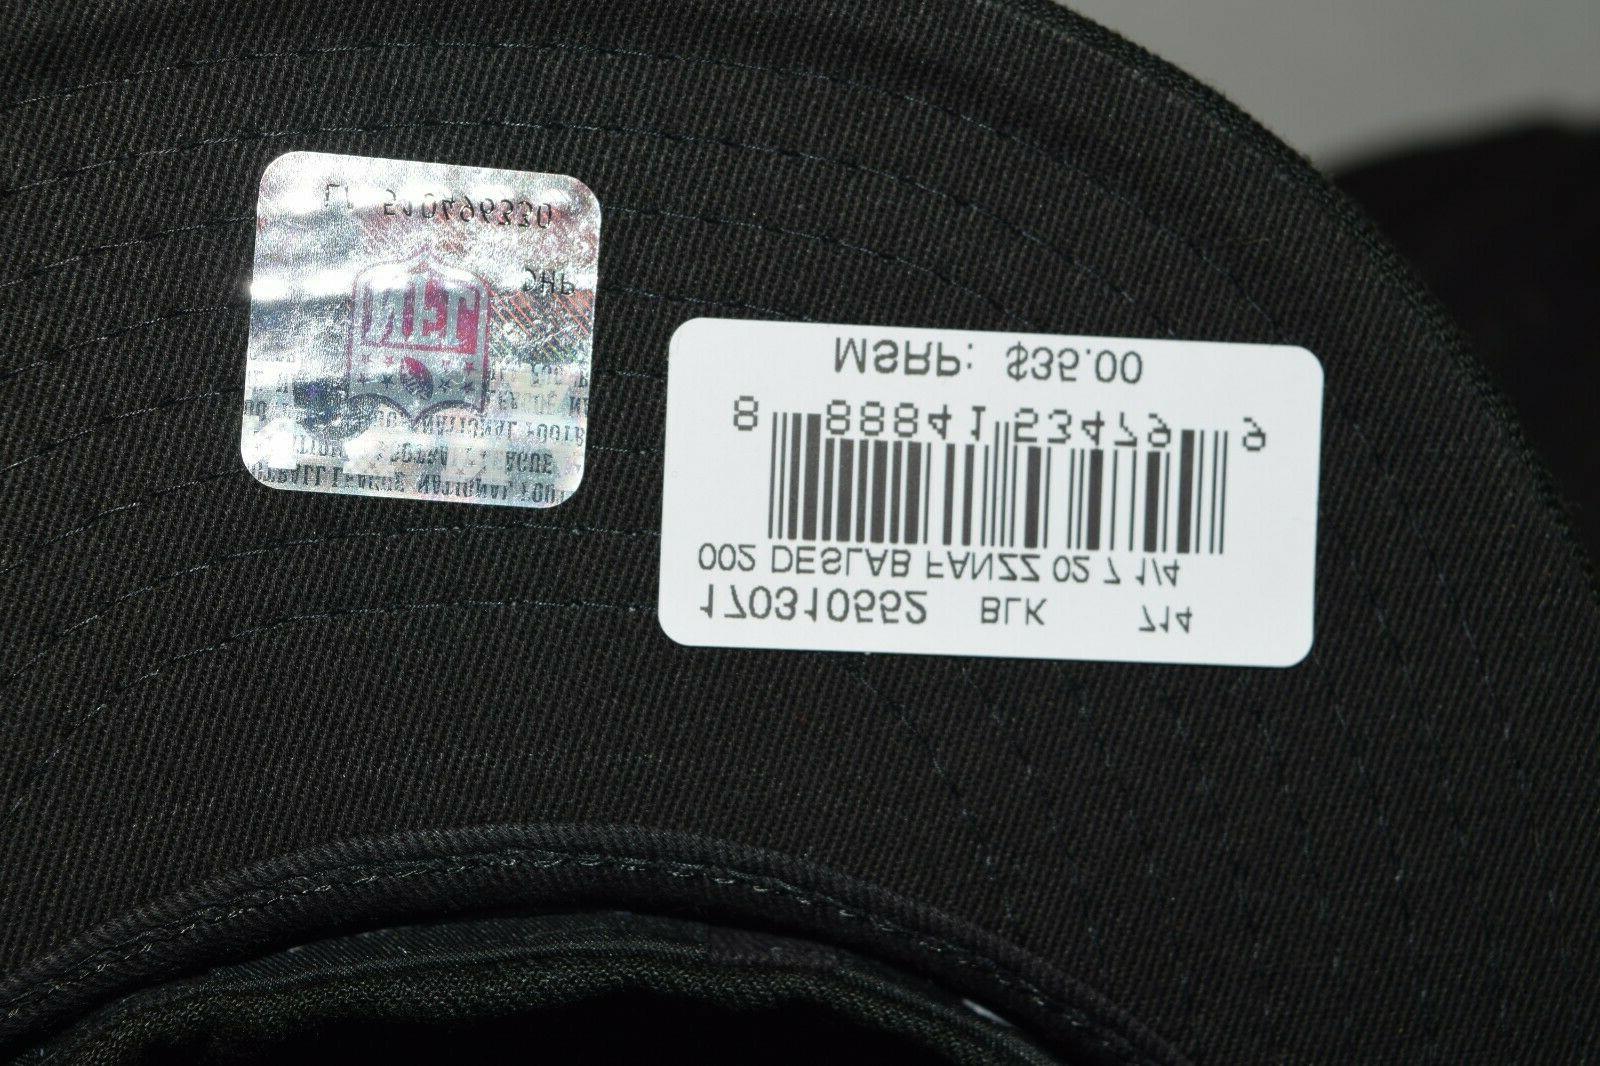 Dallas Cowboys New 59FIFTY Baseball Star Hat Cap Sizes